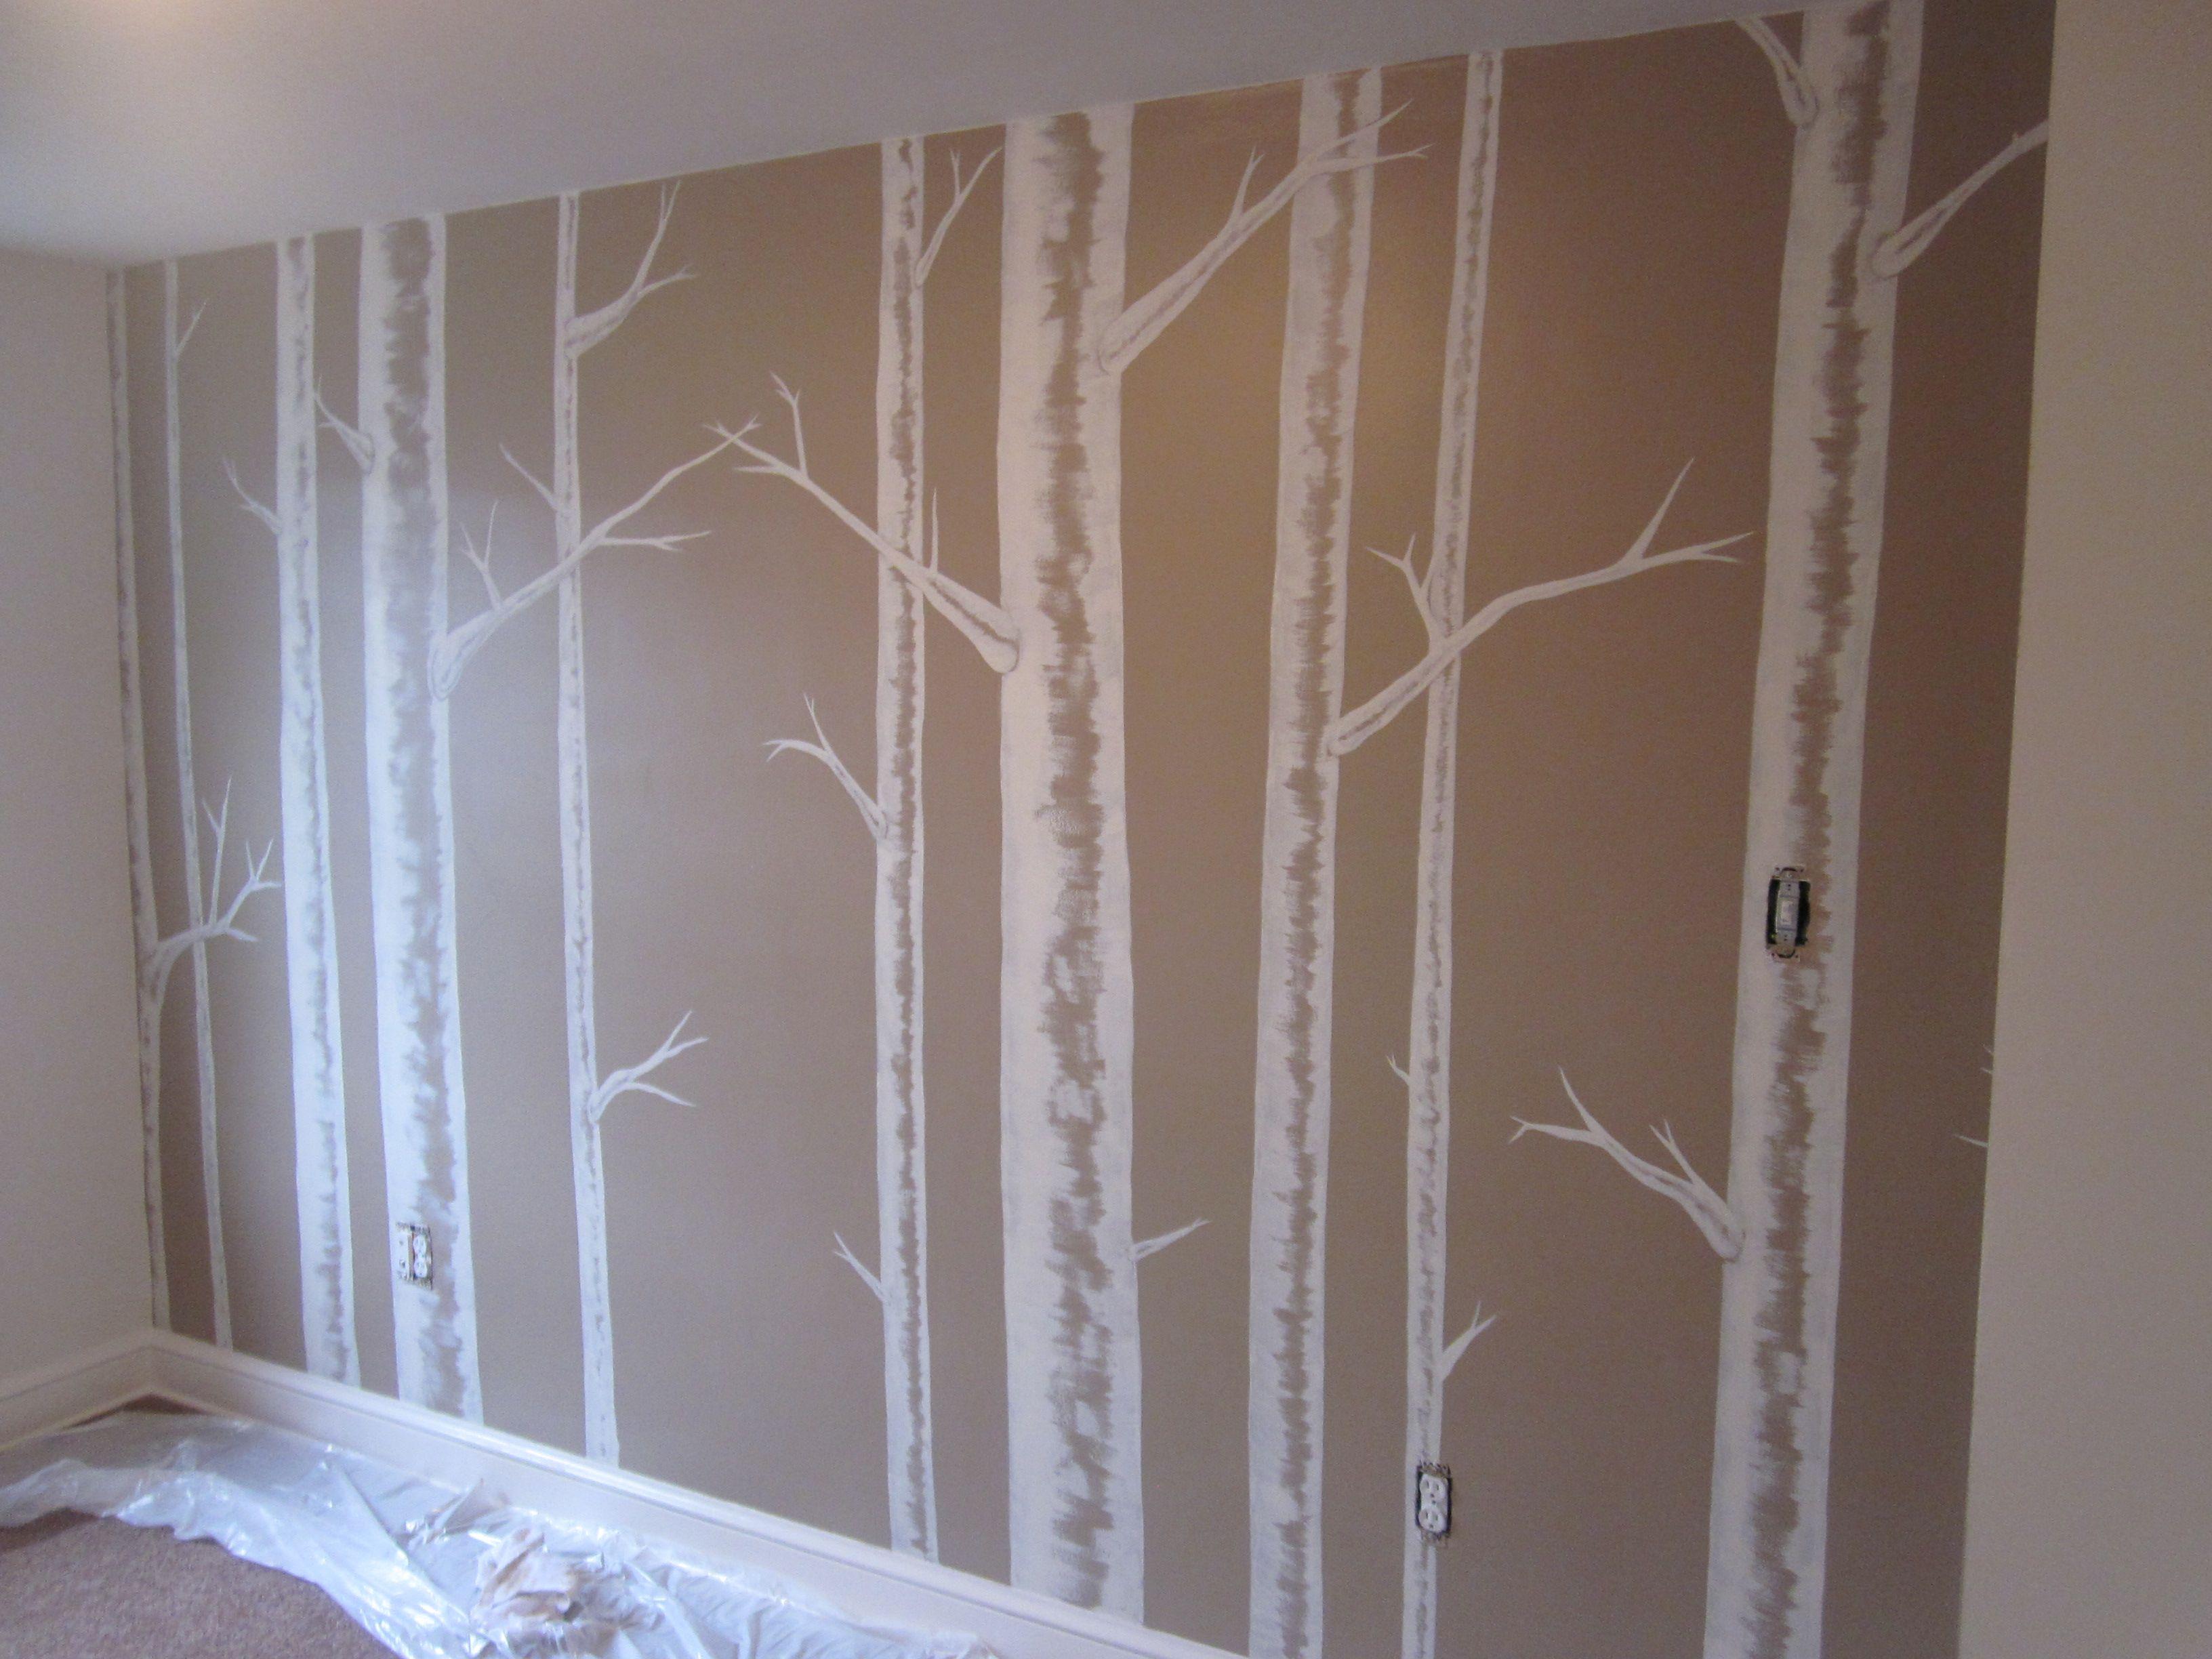 Birch Tree Tutorial In 2019 Tree Wall Murals Birch Tree